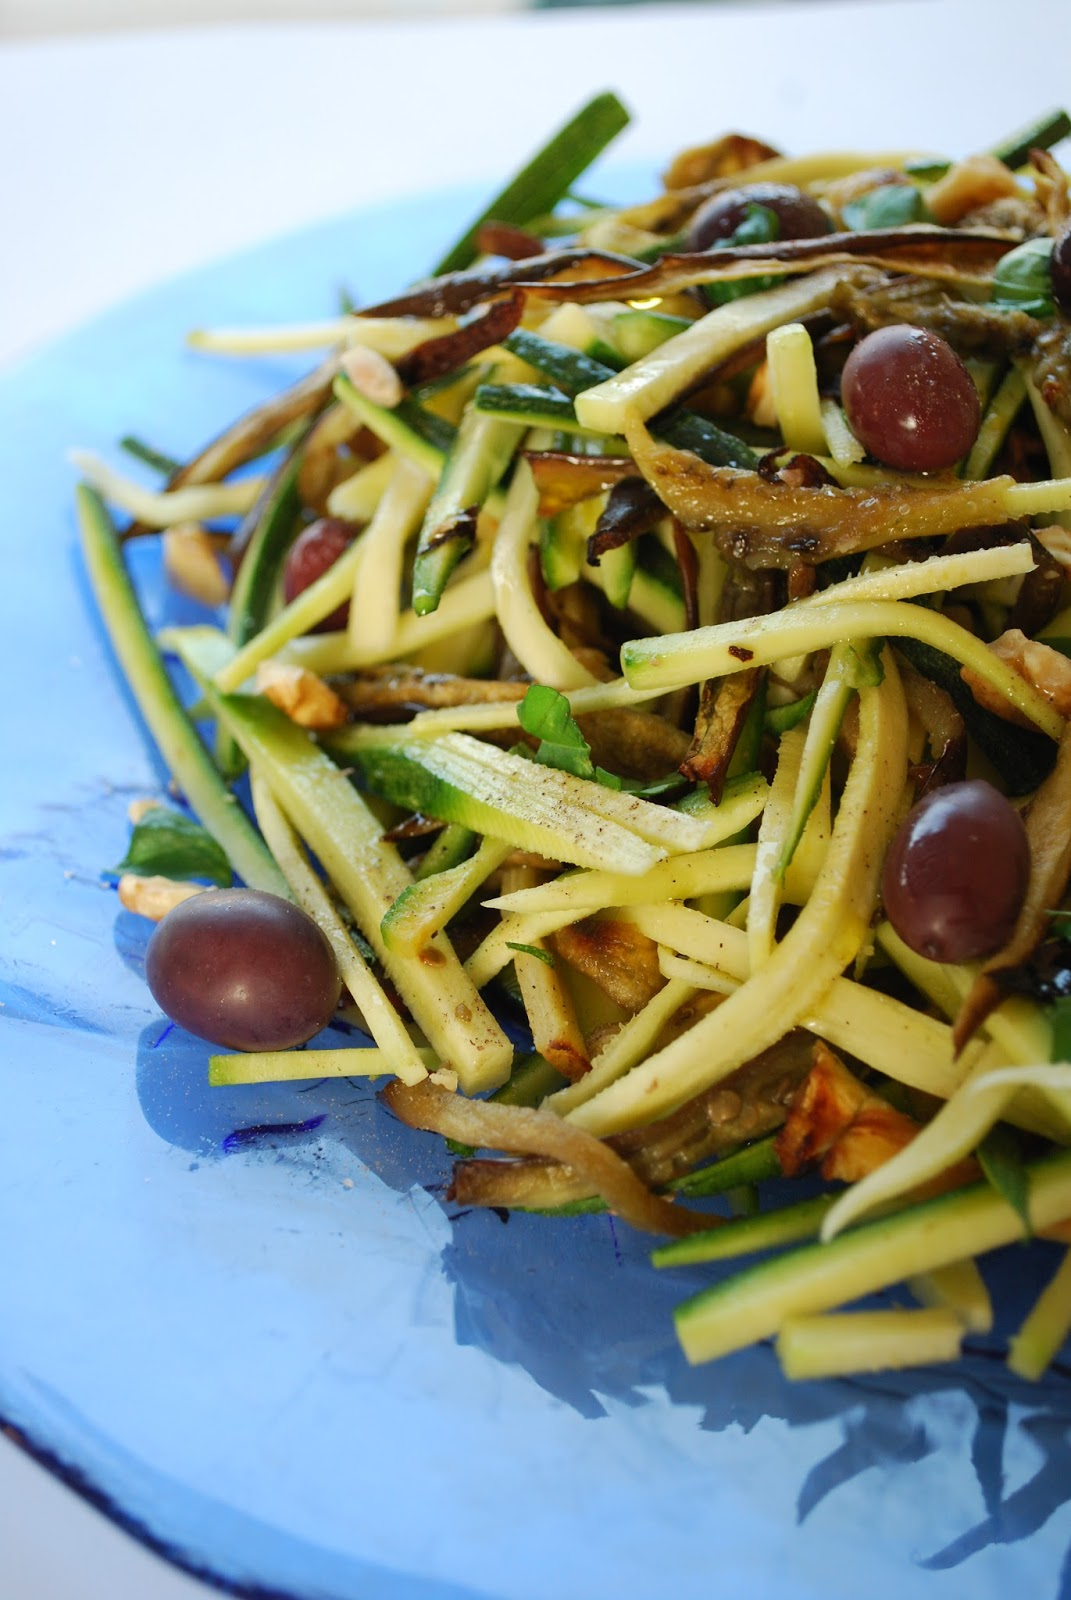 insalata di zucchine crude e melanzane